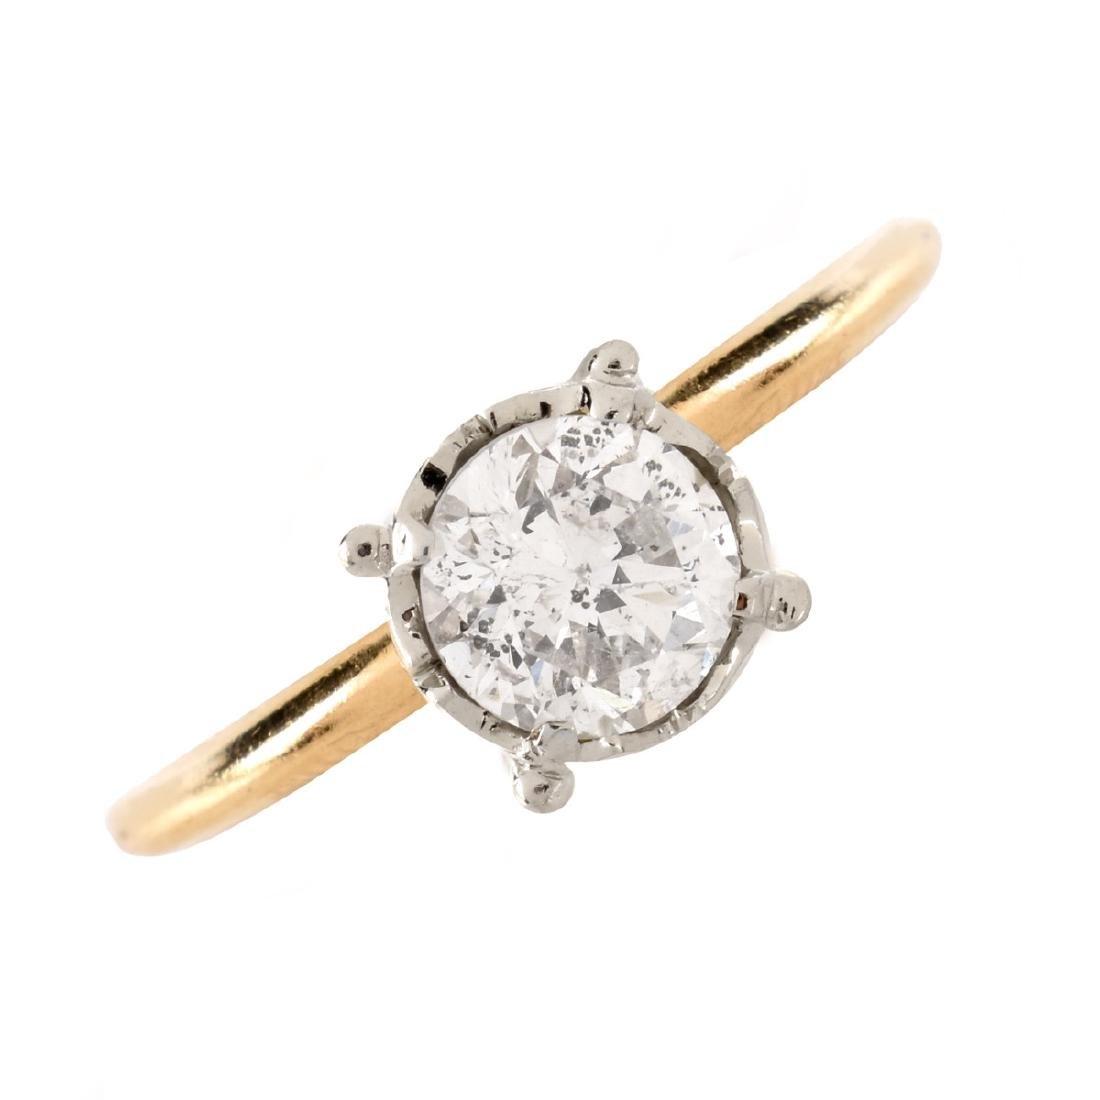 1.0 Carat Diamond and 14K Ring